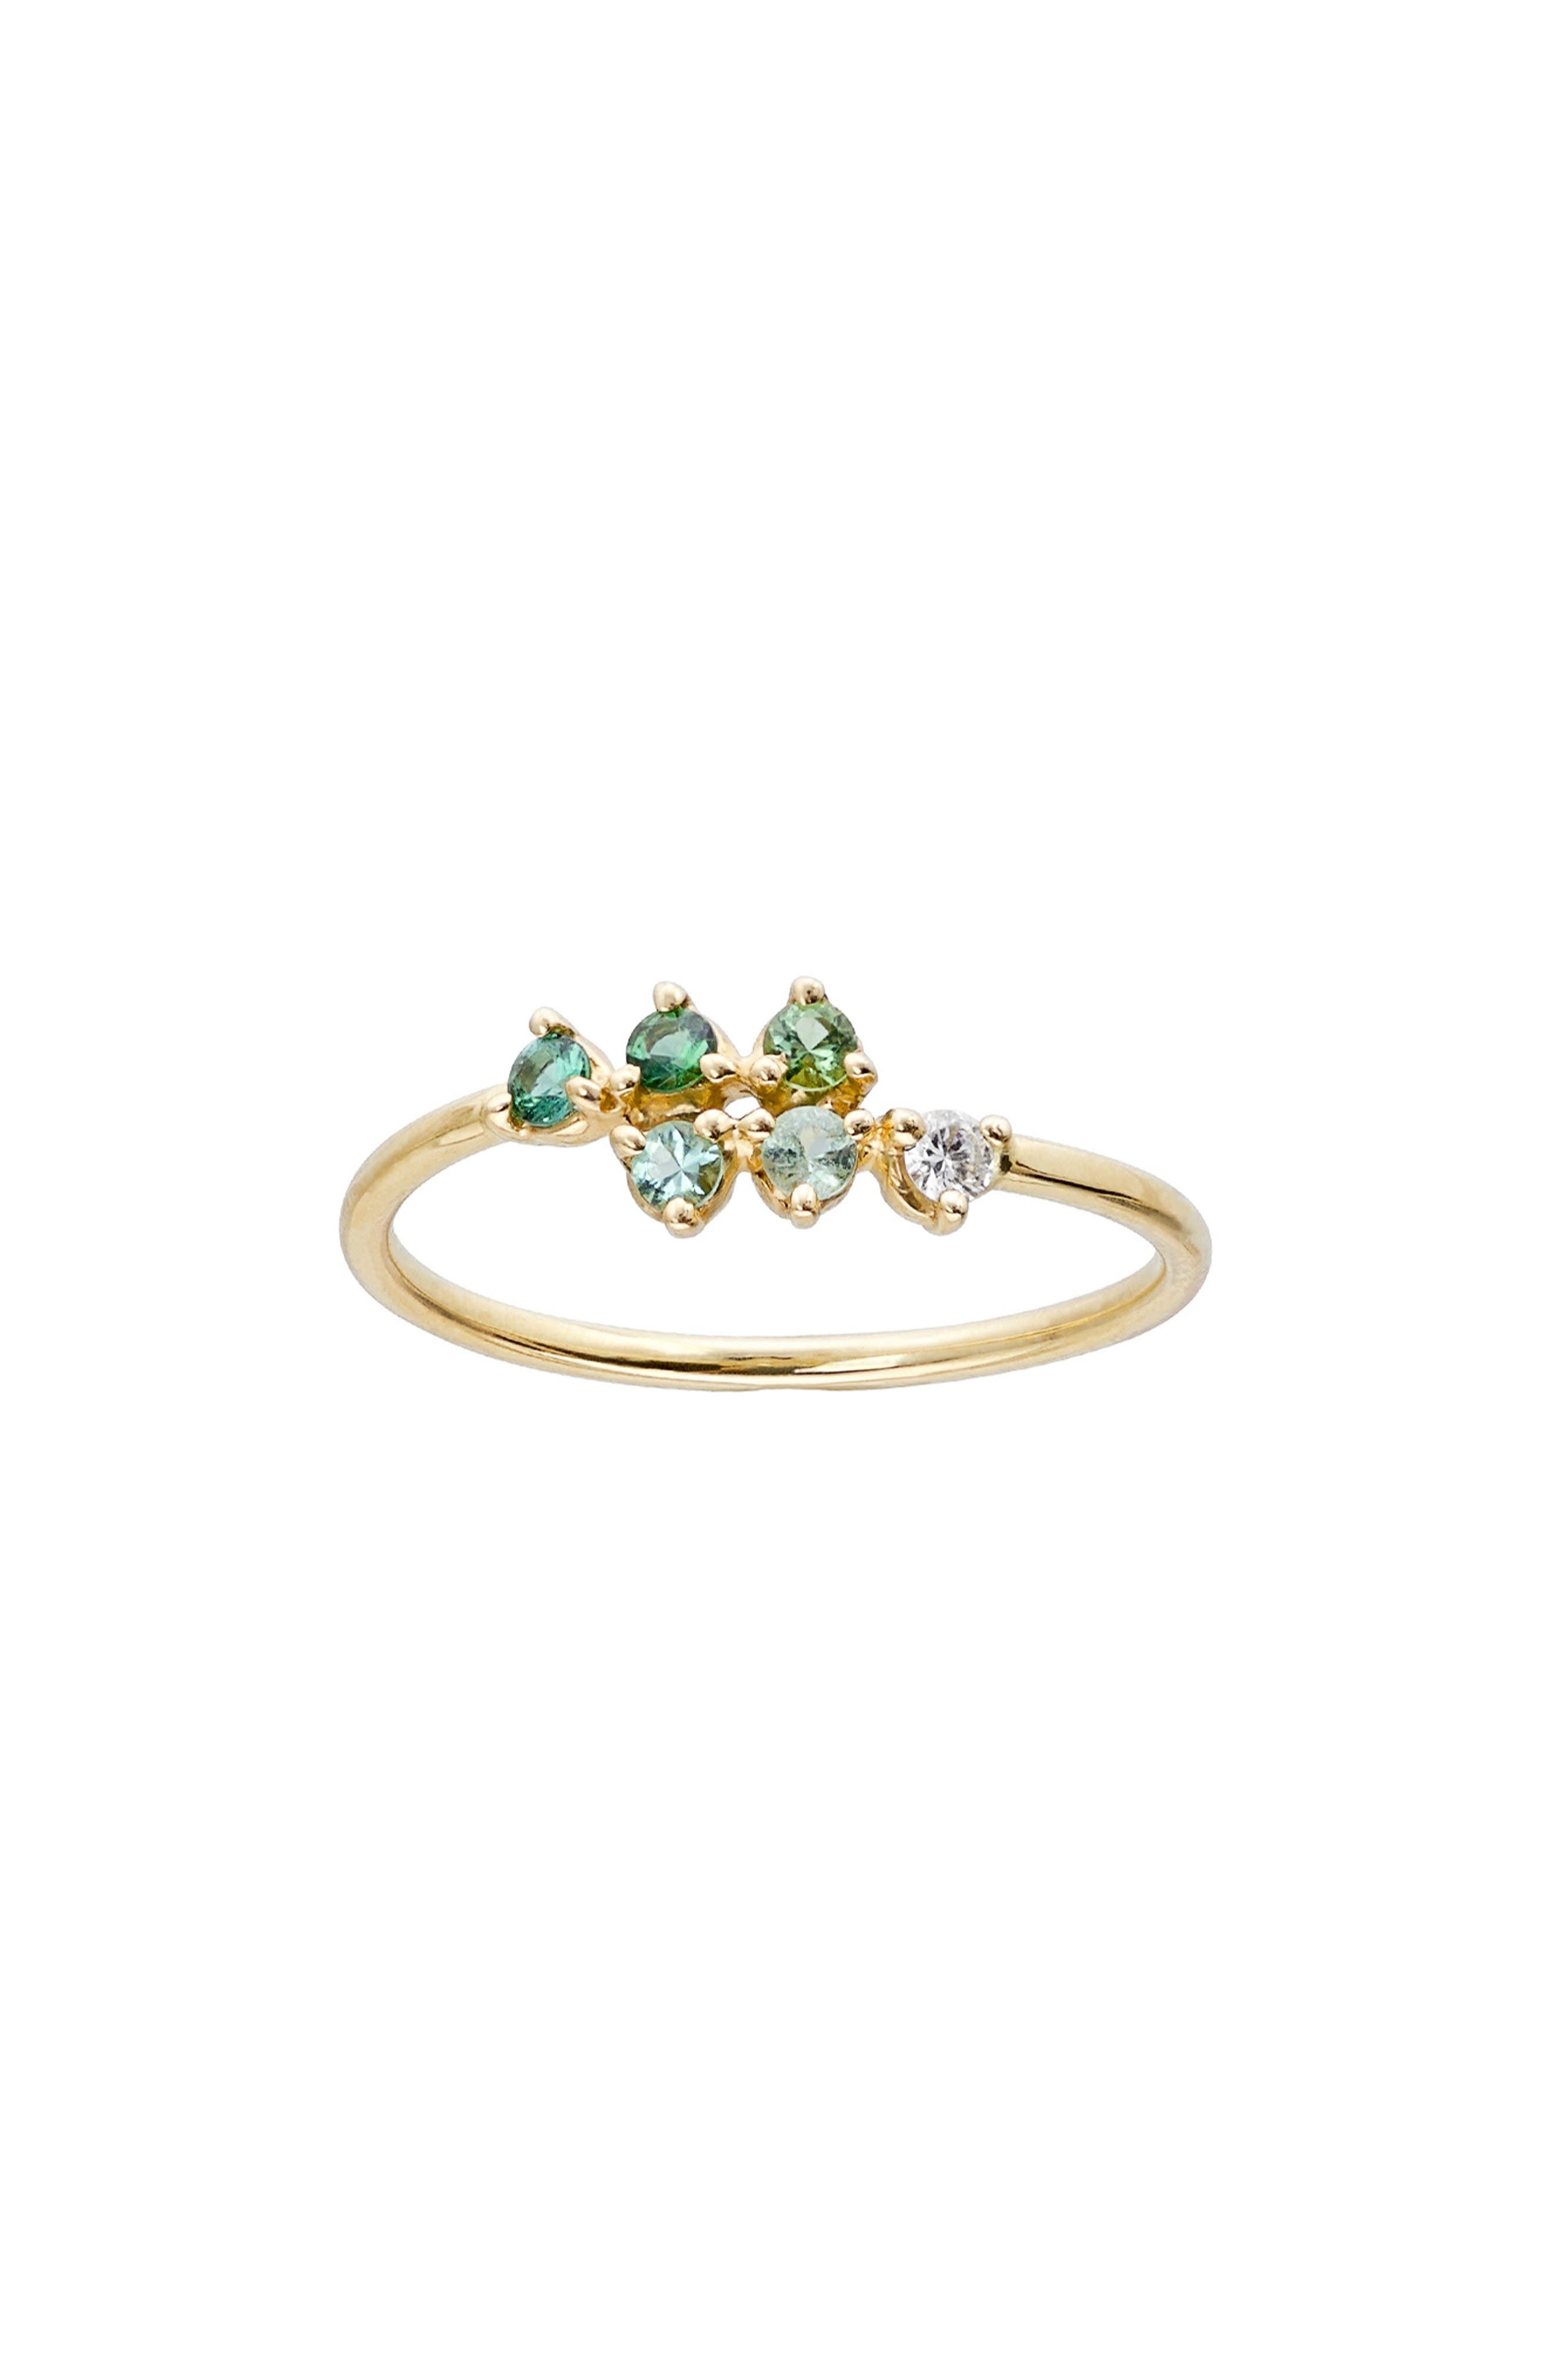 WWAKE Botany Mirrored Points Gradient Green Tourmaline & Diamond Ring in 14Kt Gold